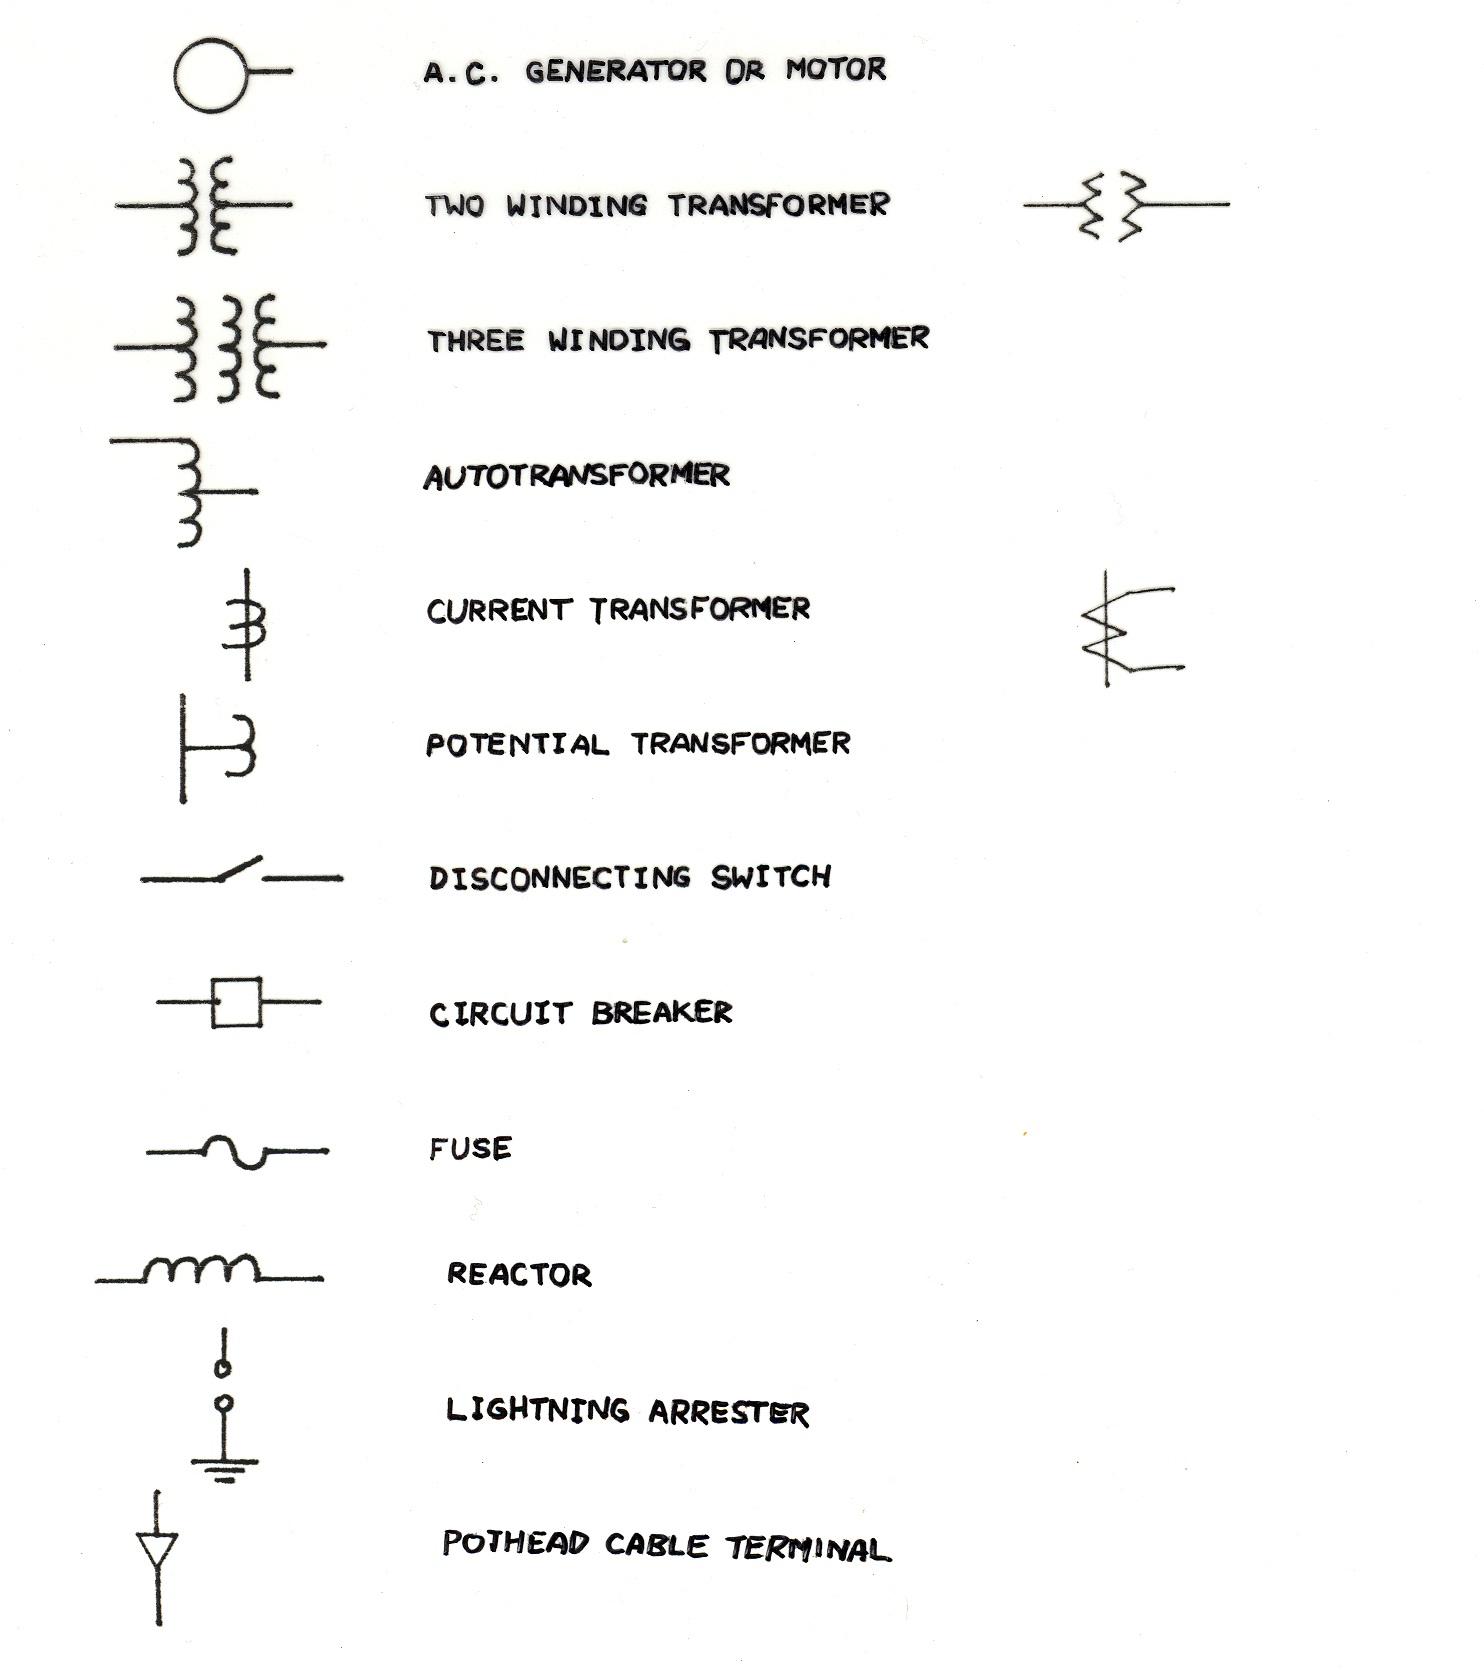 wiring diagram substation multiplication array one line electrical symbols manual e books